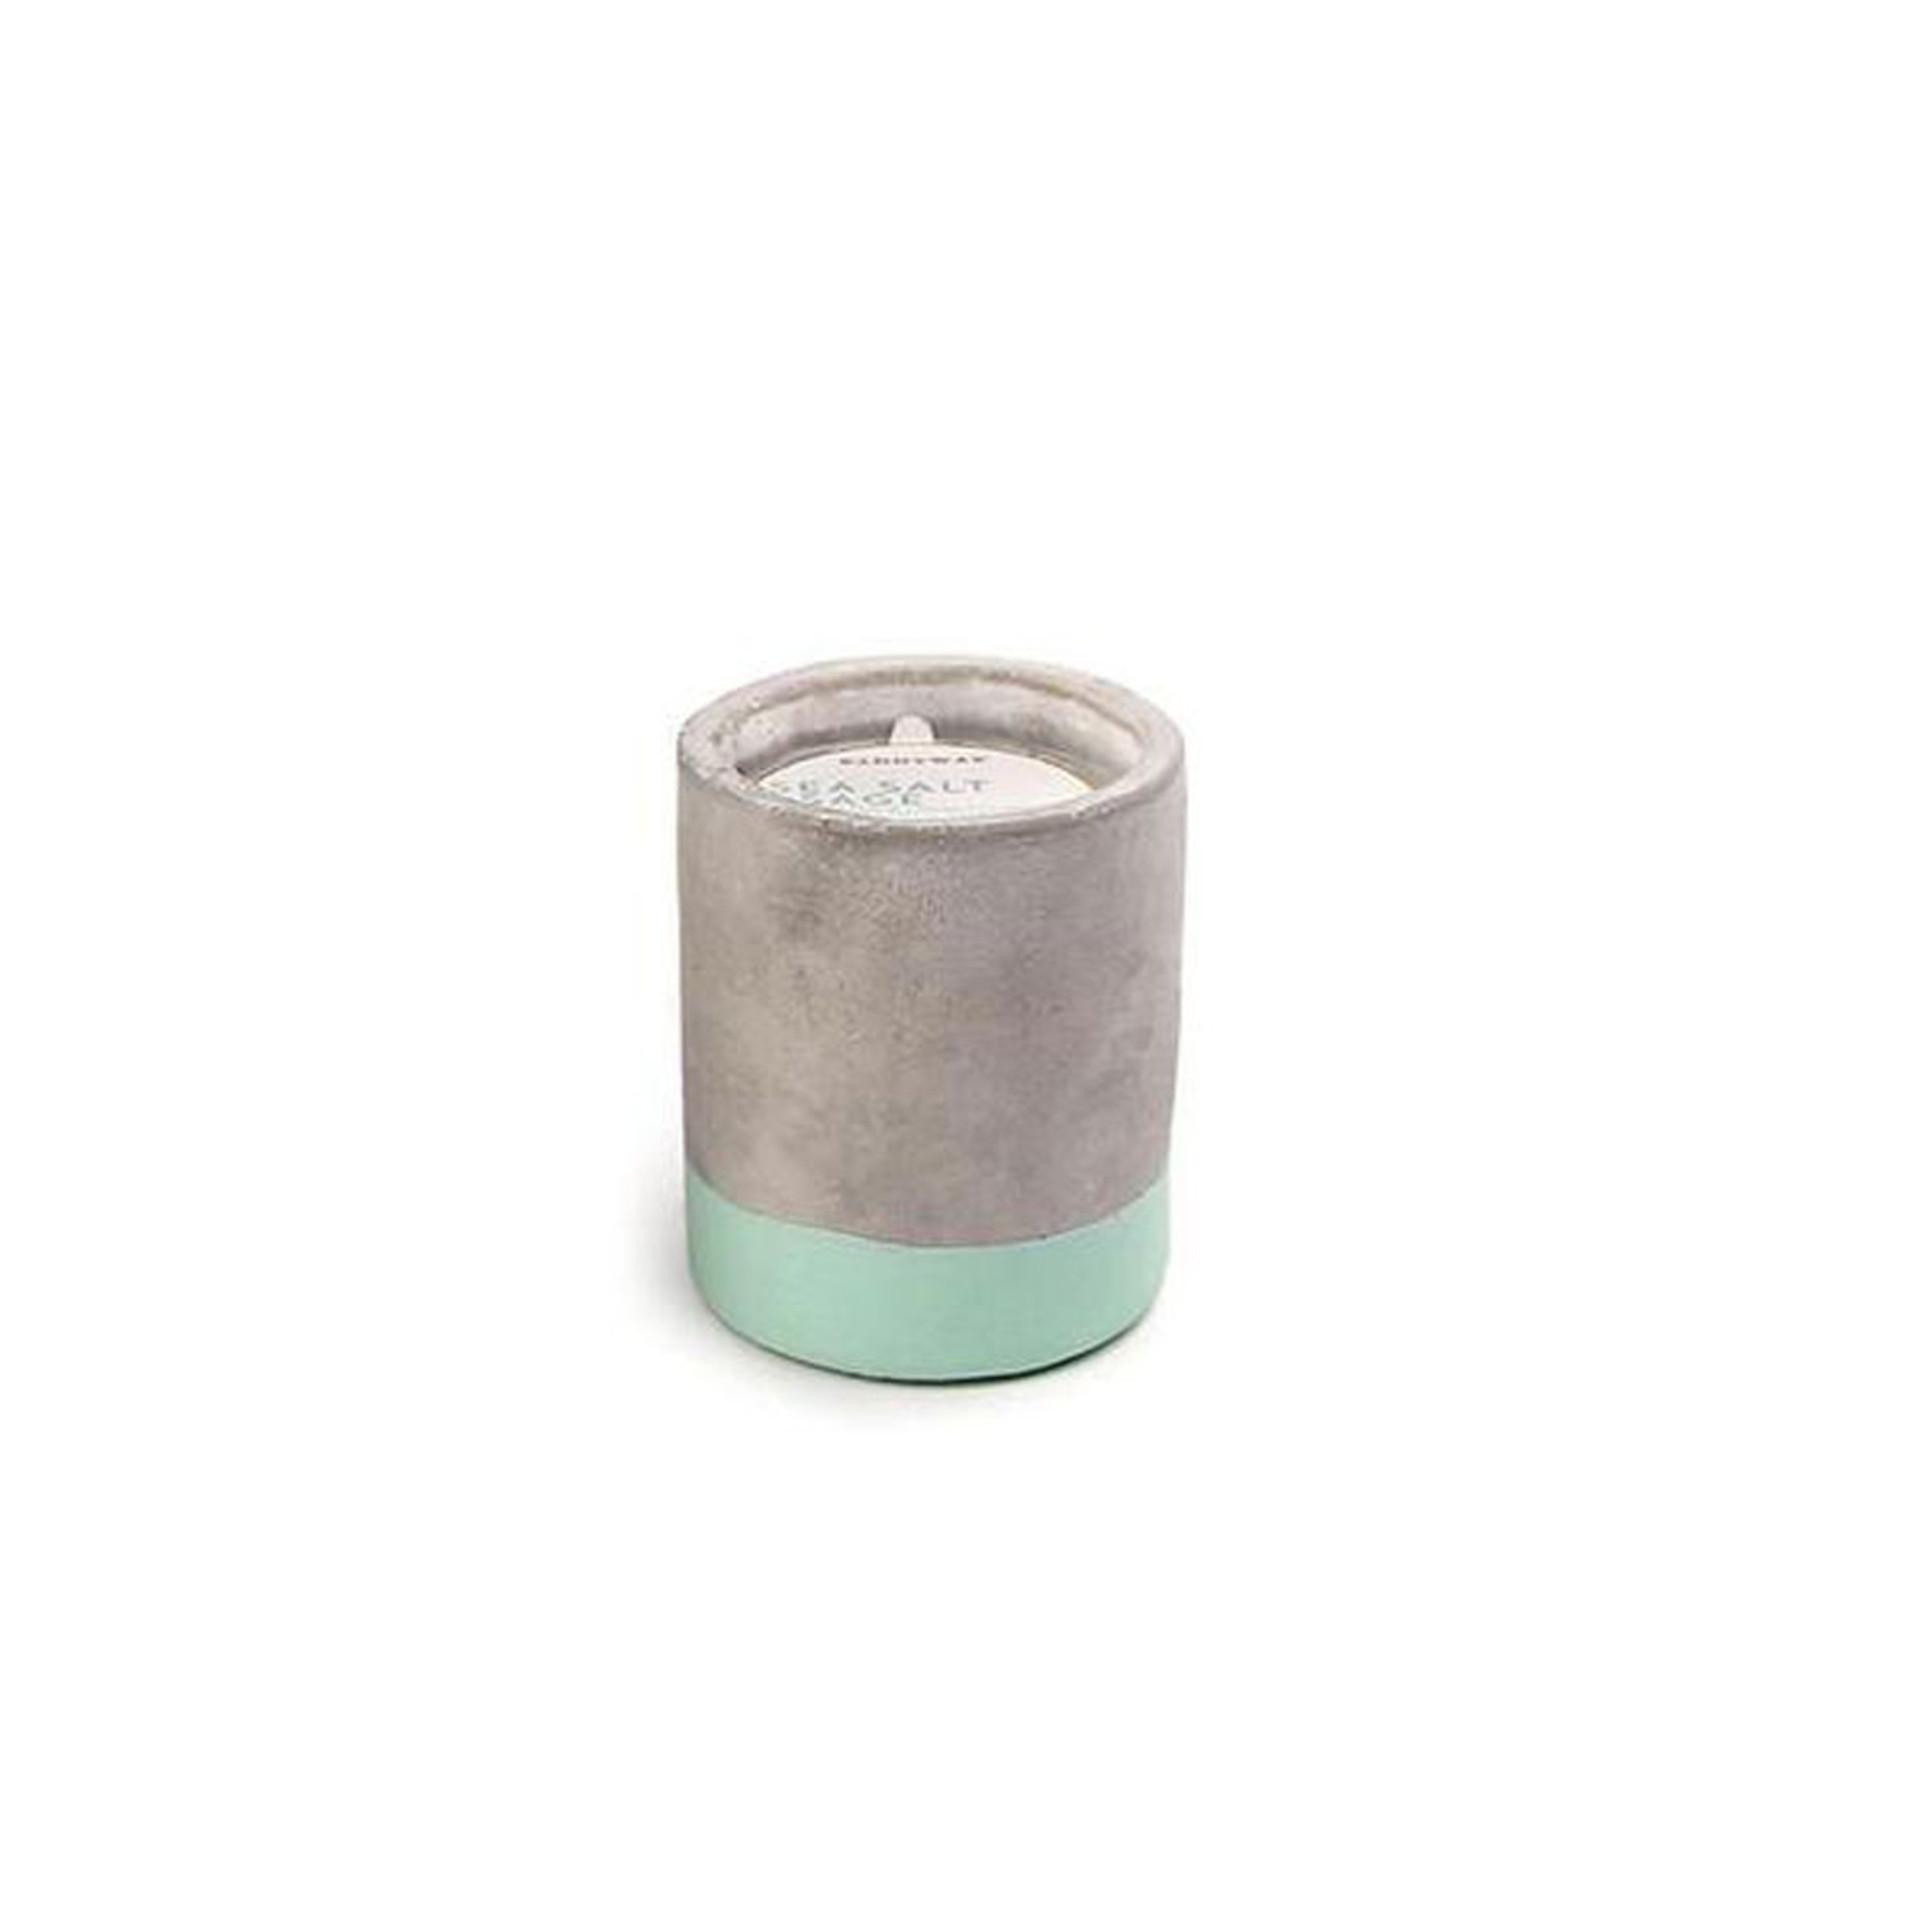 Paddywax Sea Salt Sage Urban Candle 3.5oz